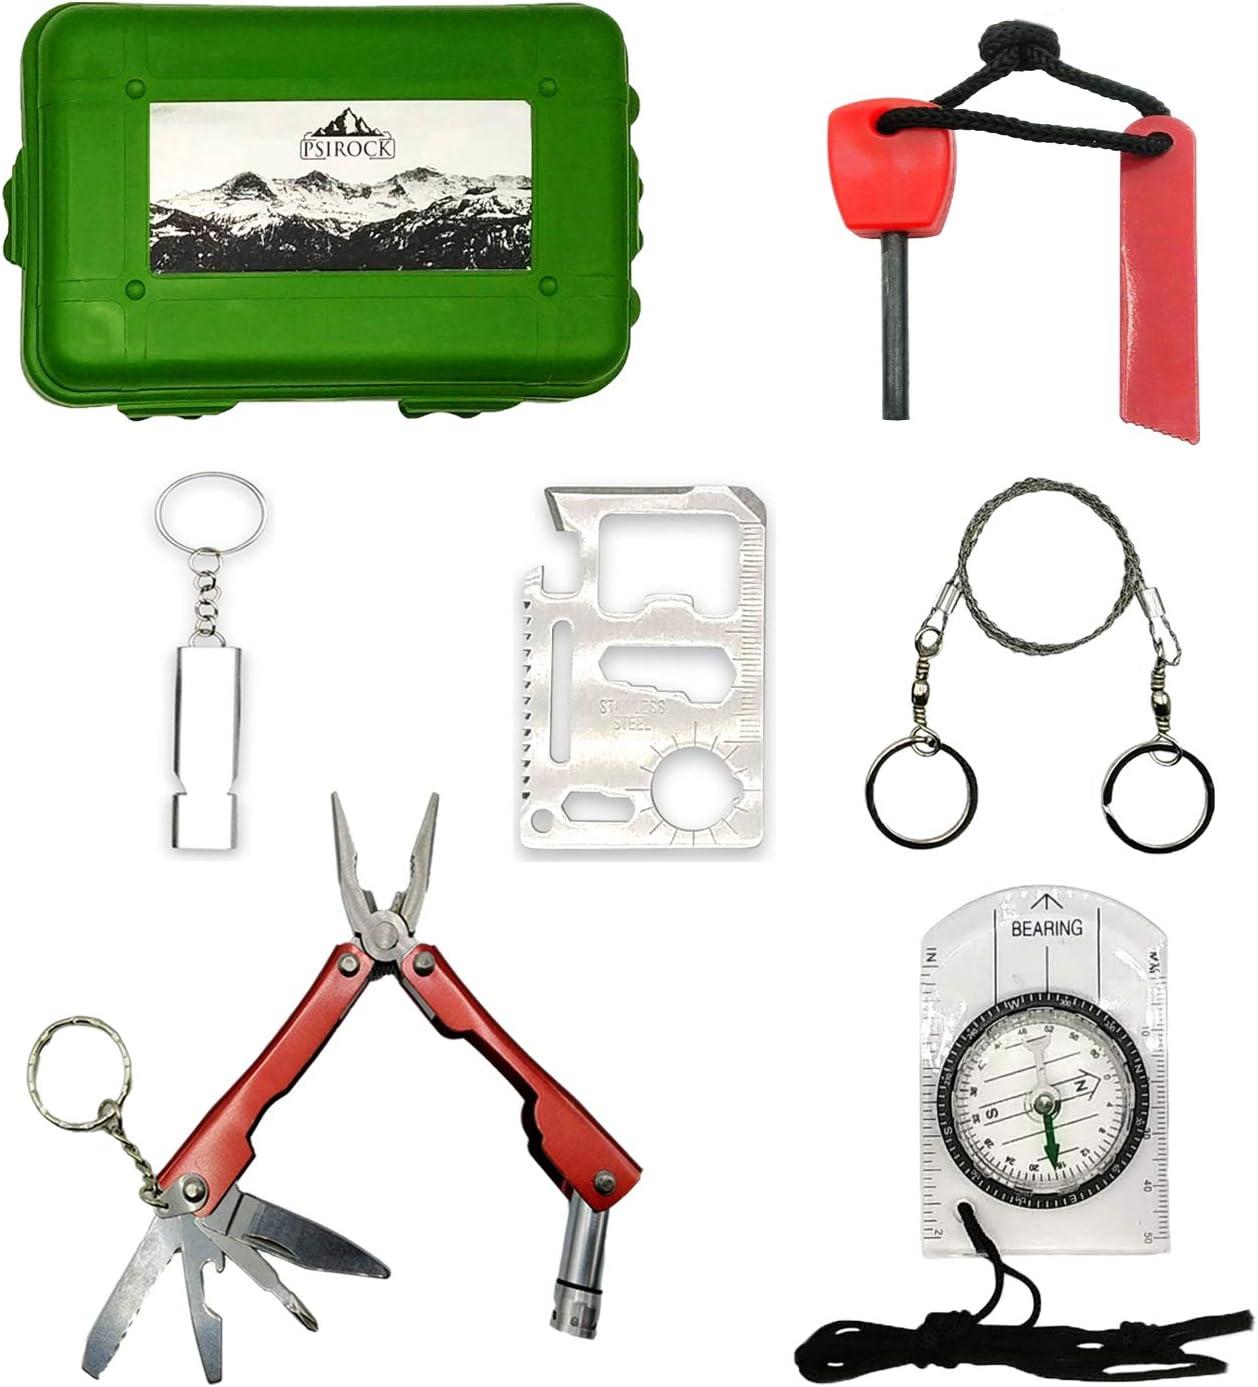 Kit supervivencia montaña Kit de supervivencia profesional | Navaja multiusos Pedernal Supervivencia accesorios acampada y vivac | Ferrocerio supervivencia de emergencia | Mini Survival kit Bushcraft